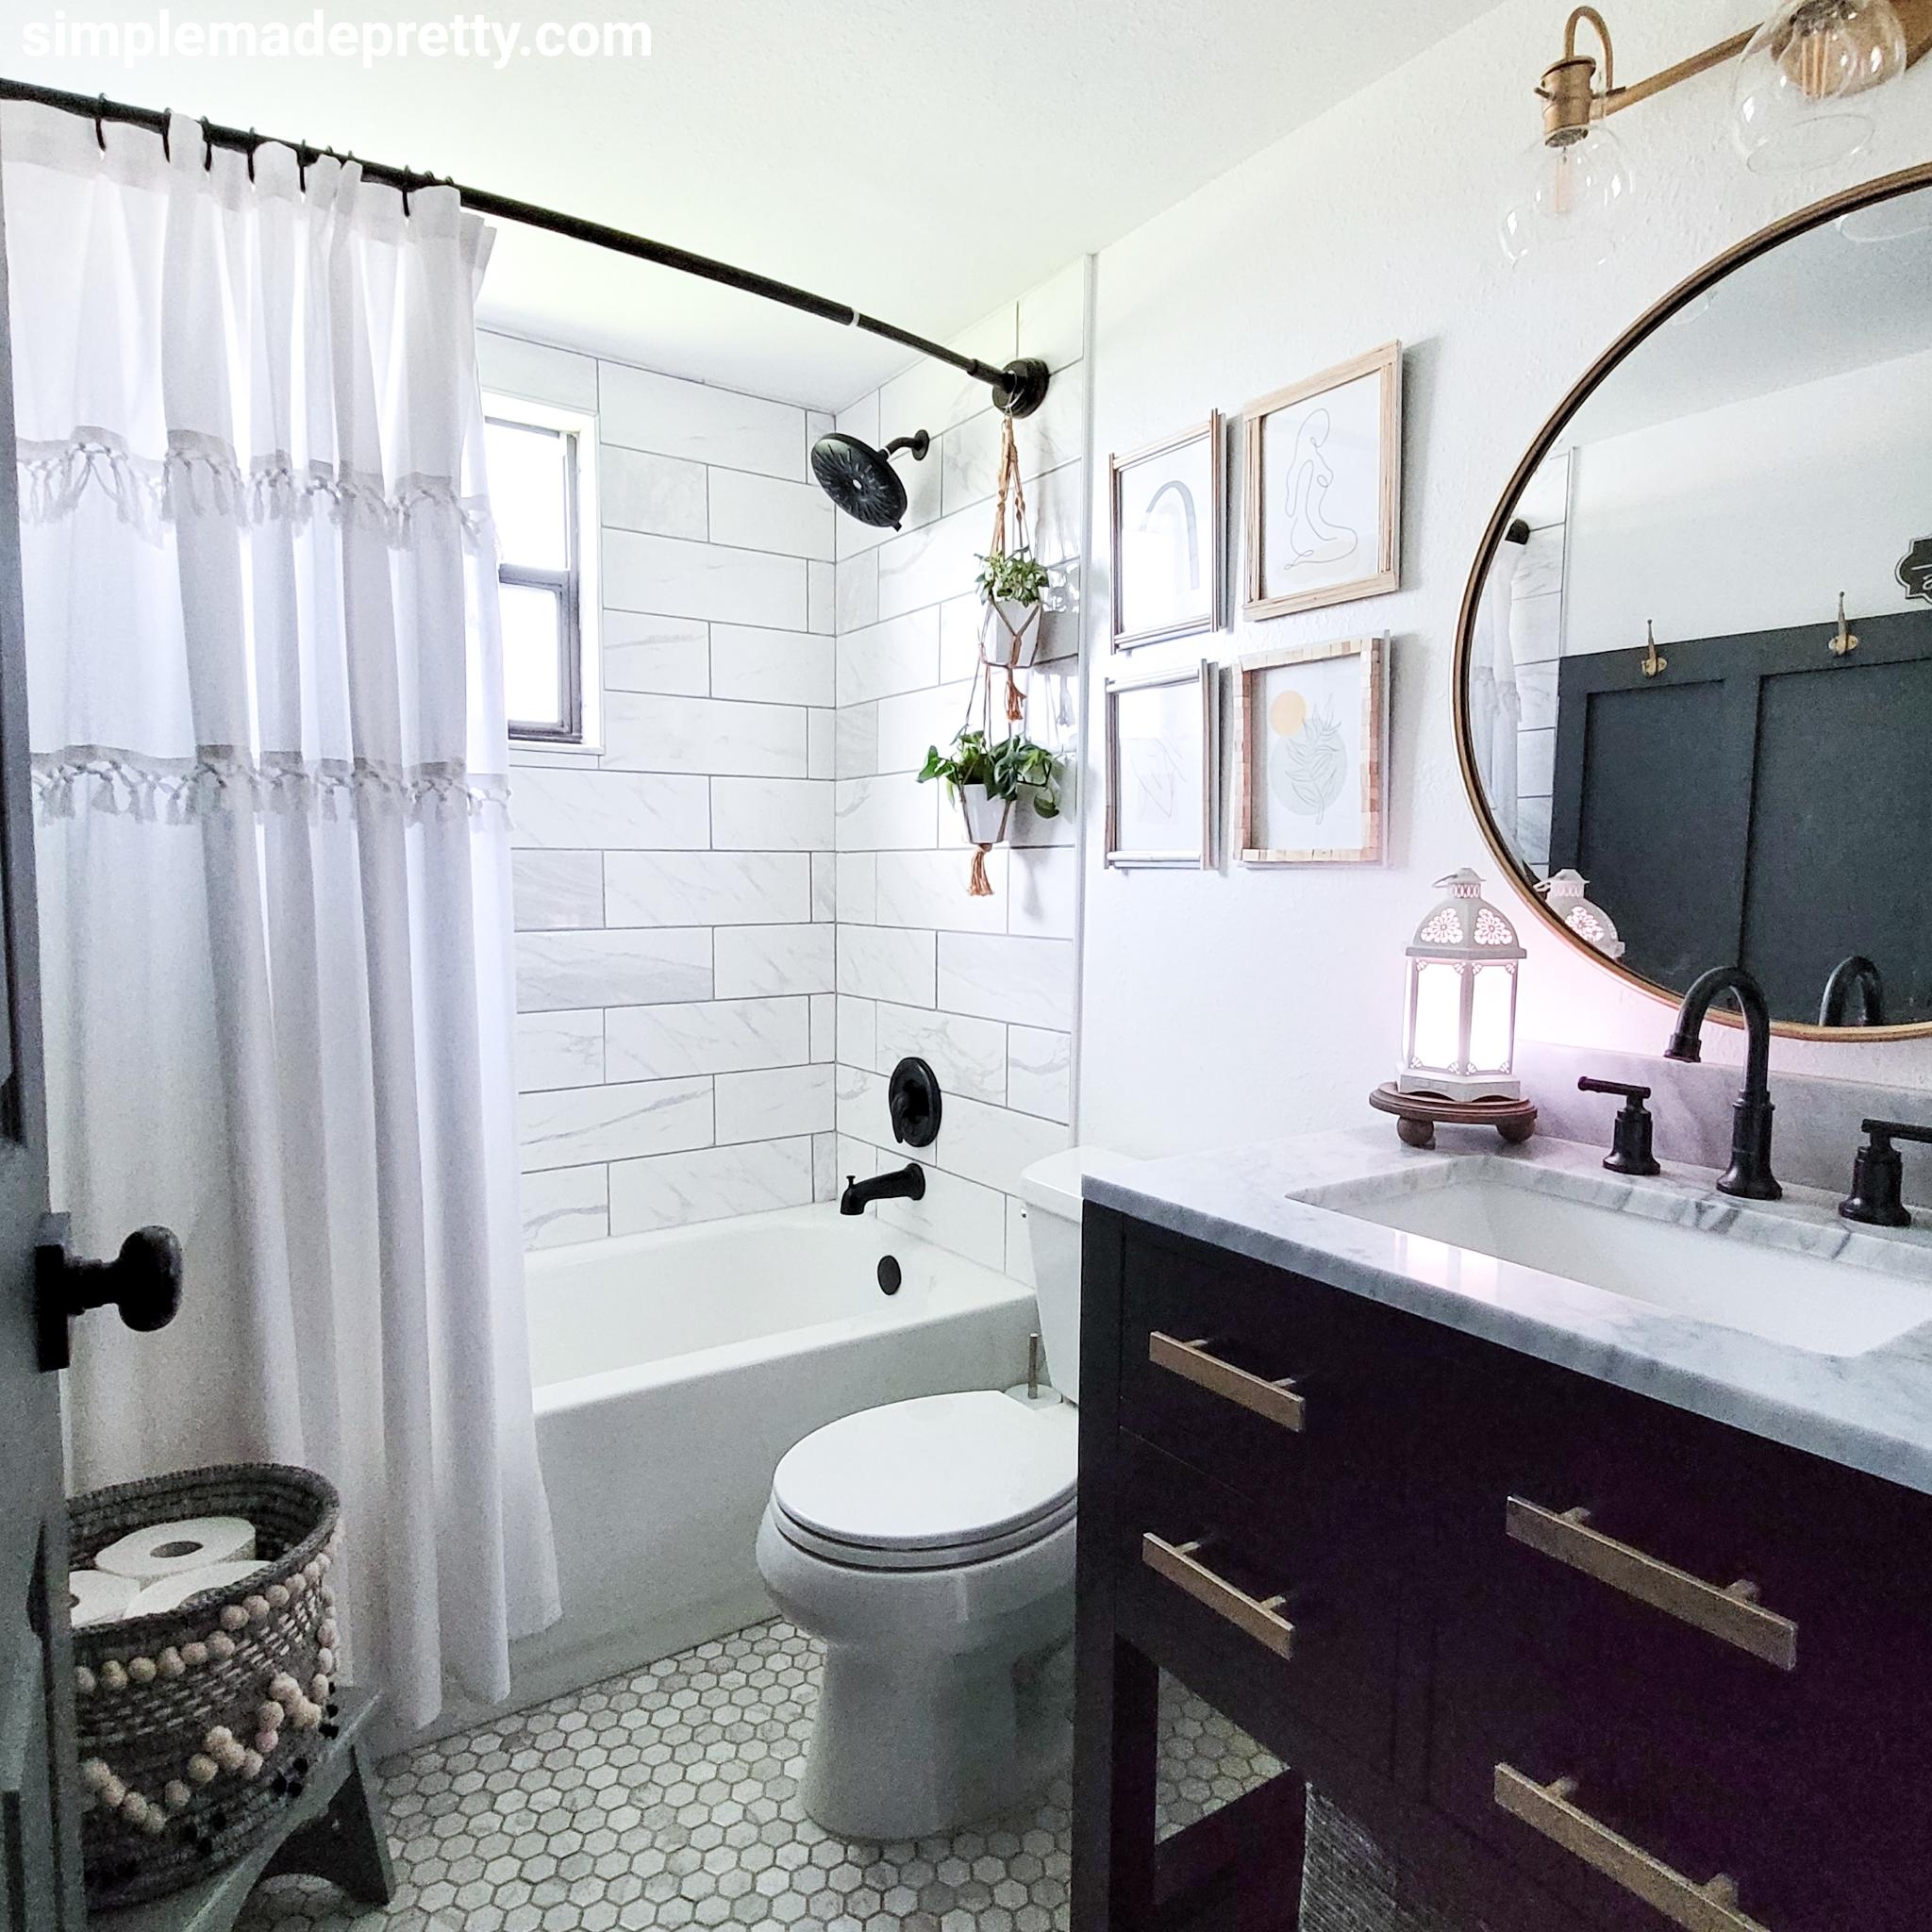 Bathroom Remodel On A Budget Simple, Updated Bathroom Ideas